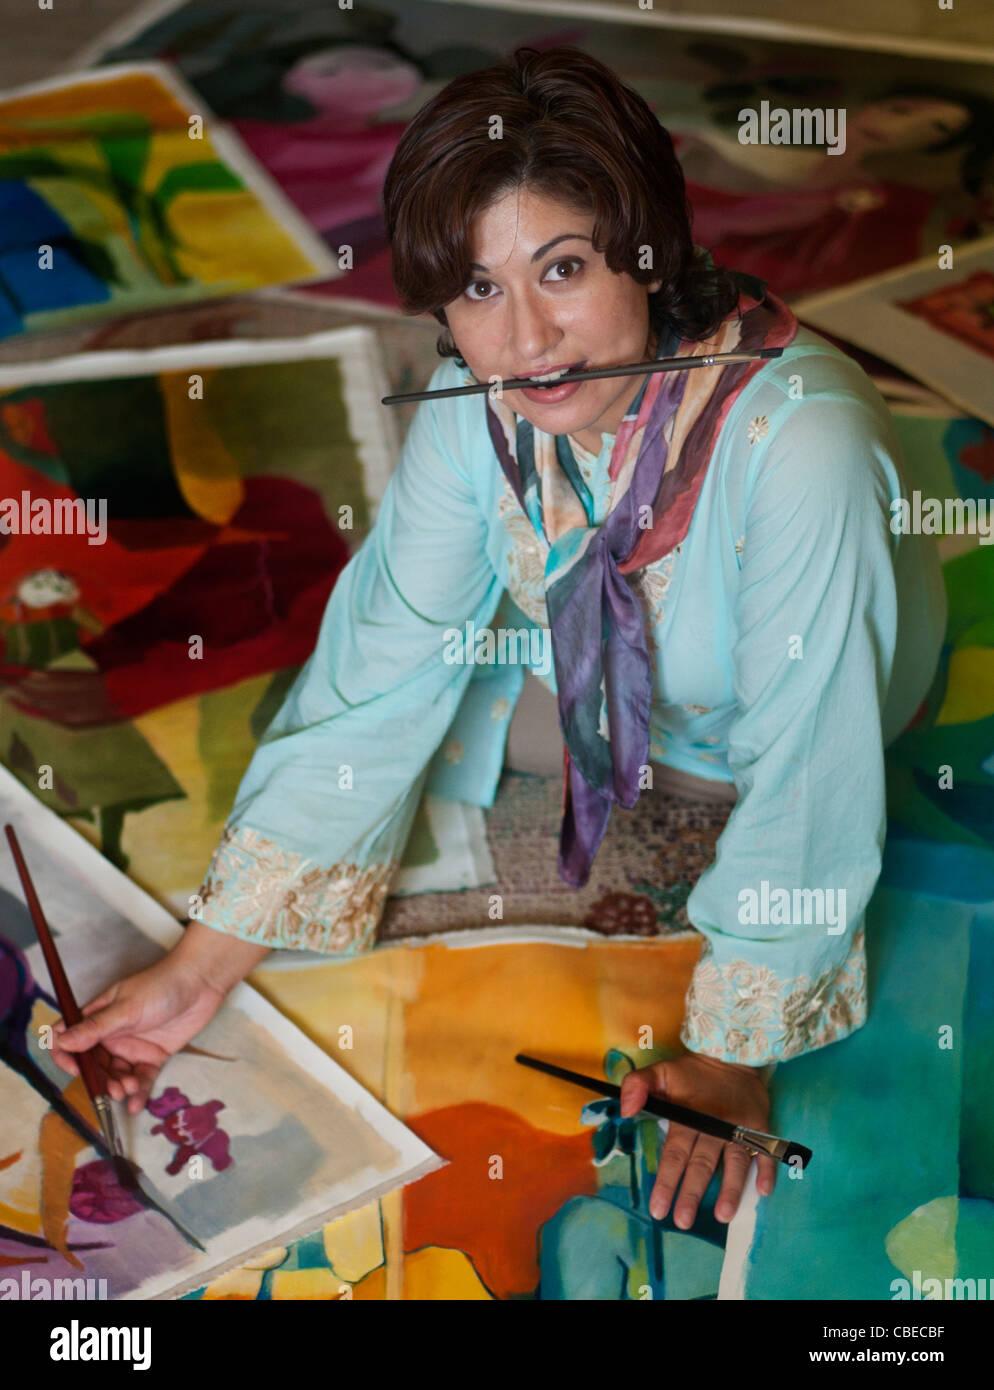 Artist at work - Stock Image